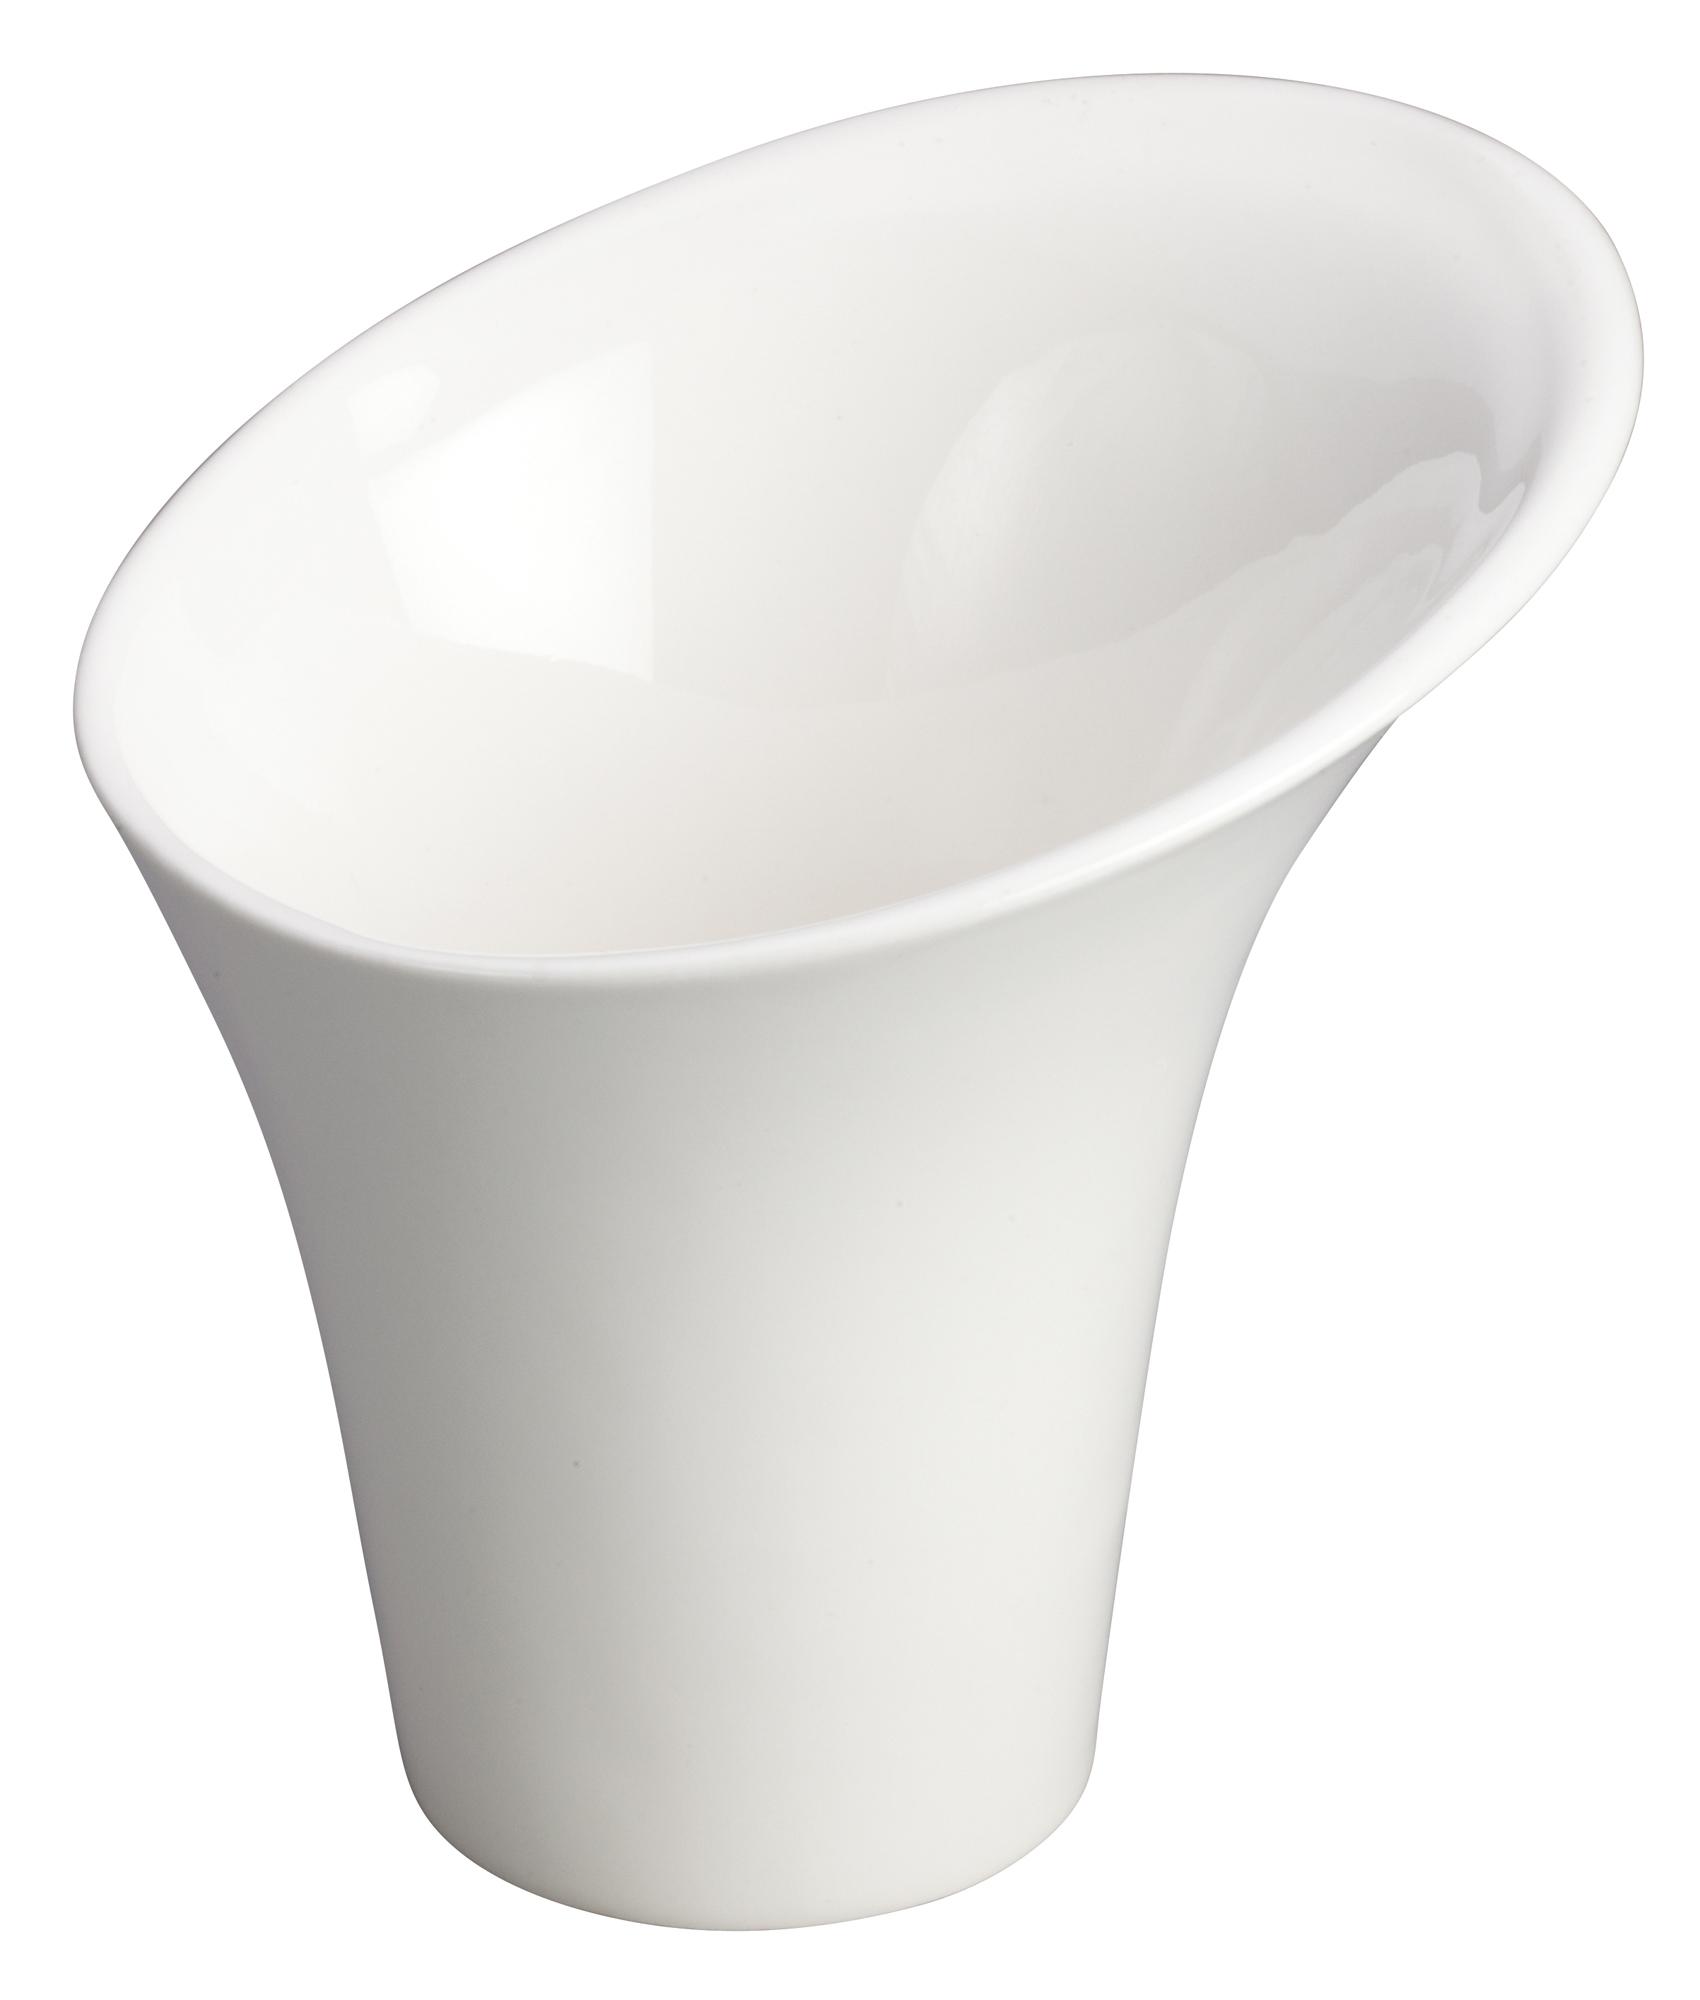 Winco WDP003-205 snack cup